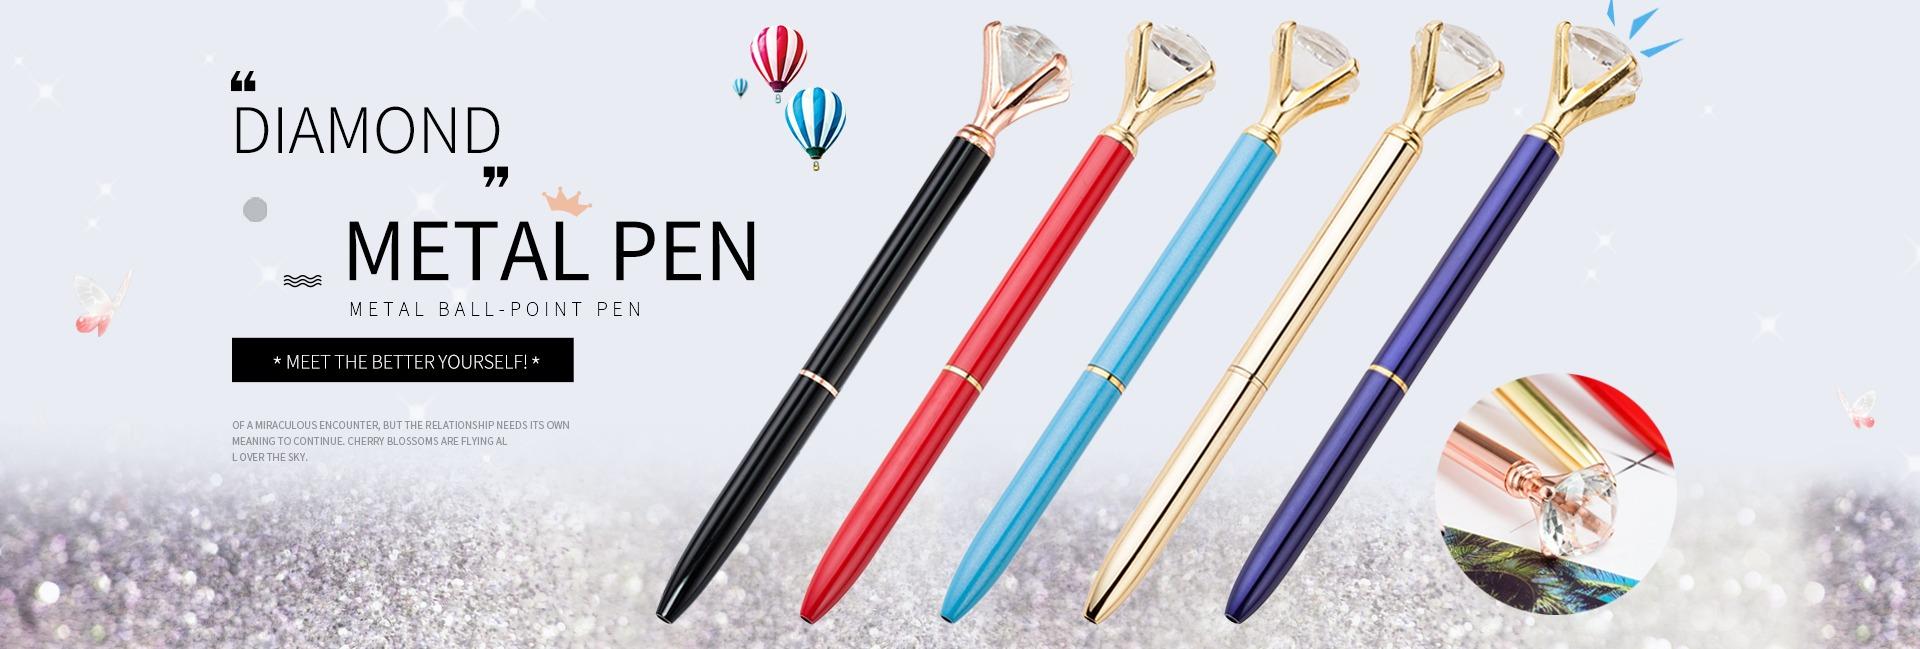 Creative Crown Diamond Pen Big Crystal Ballpoint Pen Stationery Office Supplies